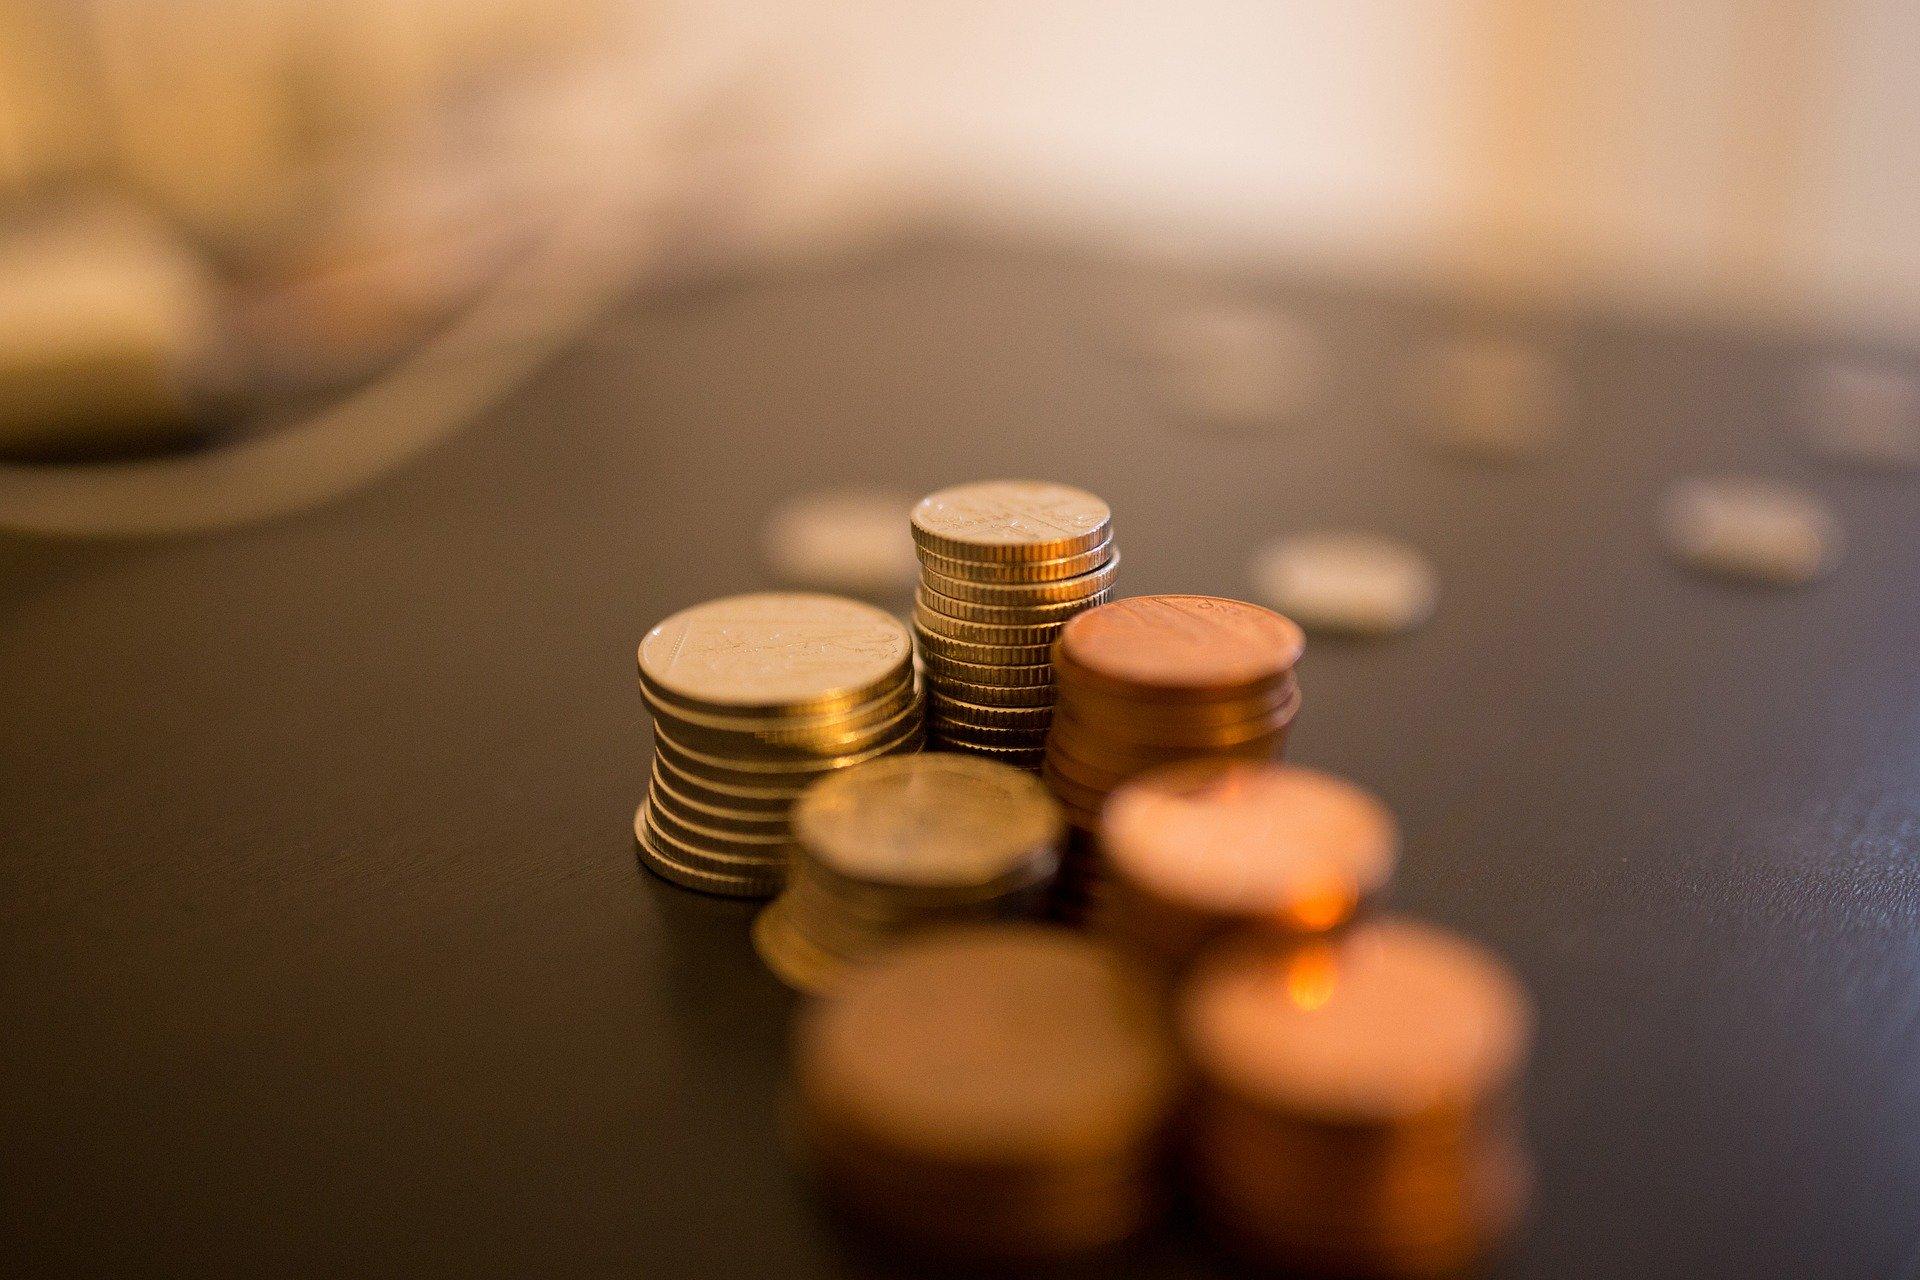 La importancia de reducir costes